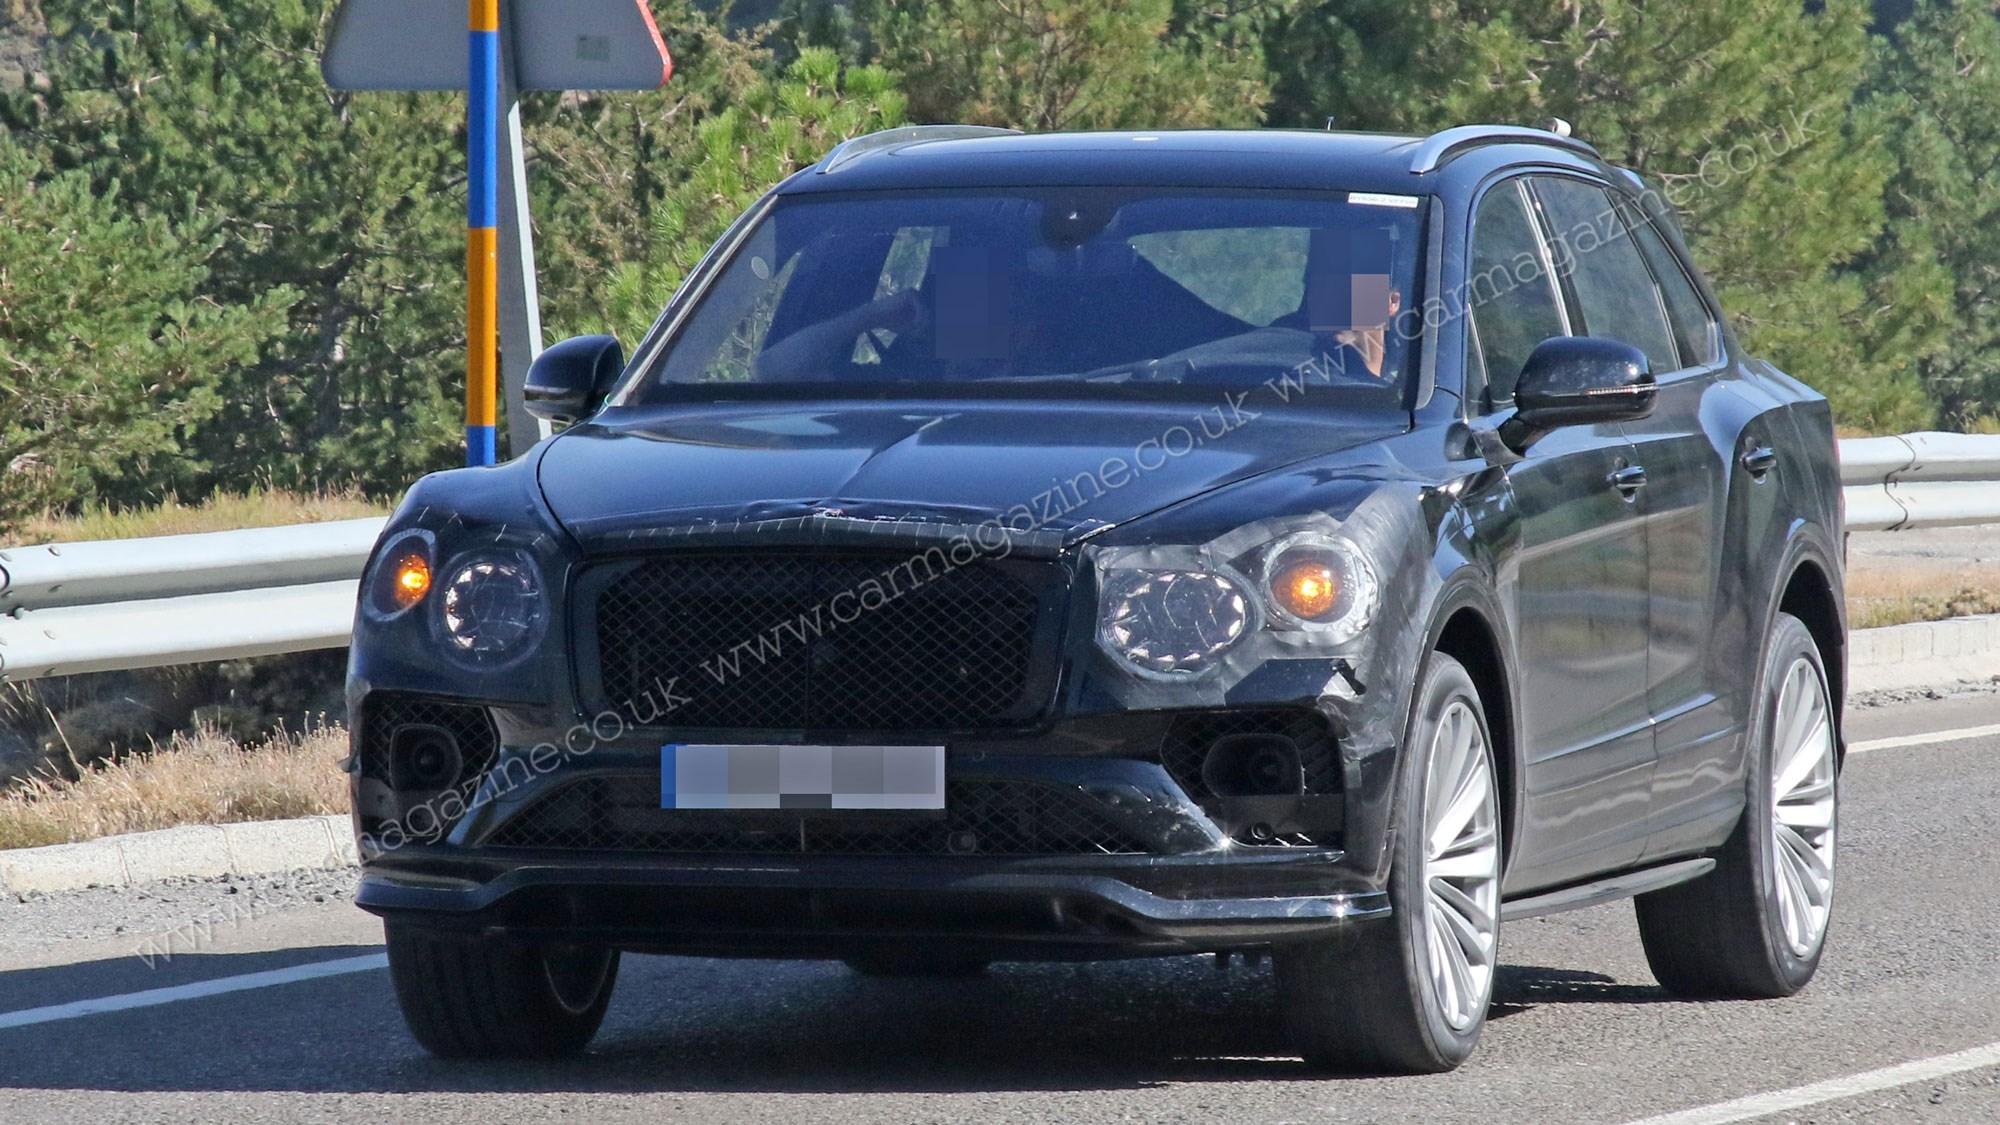 Bentley Bentayga facelift snapped